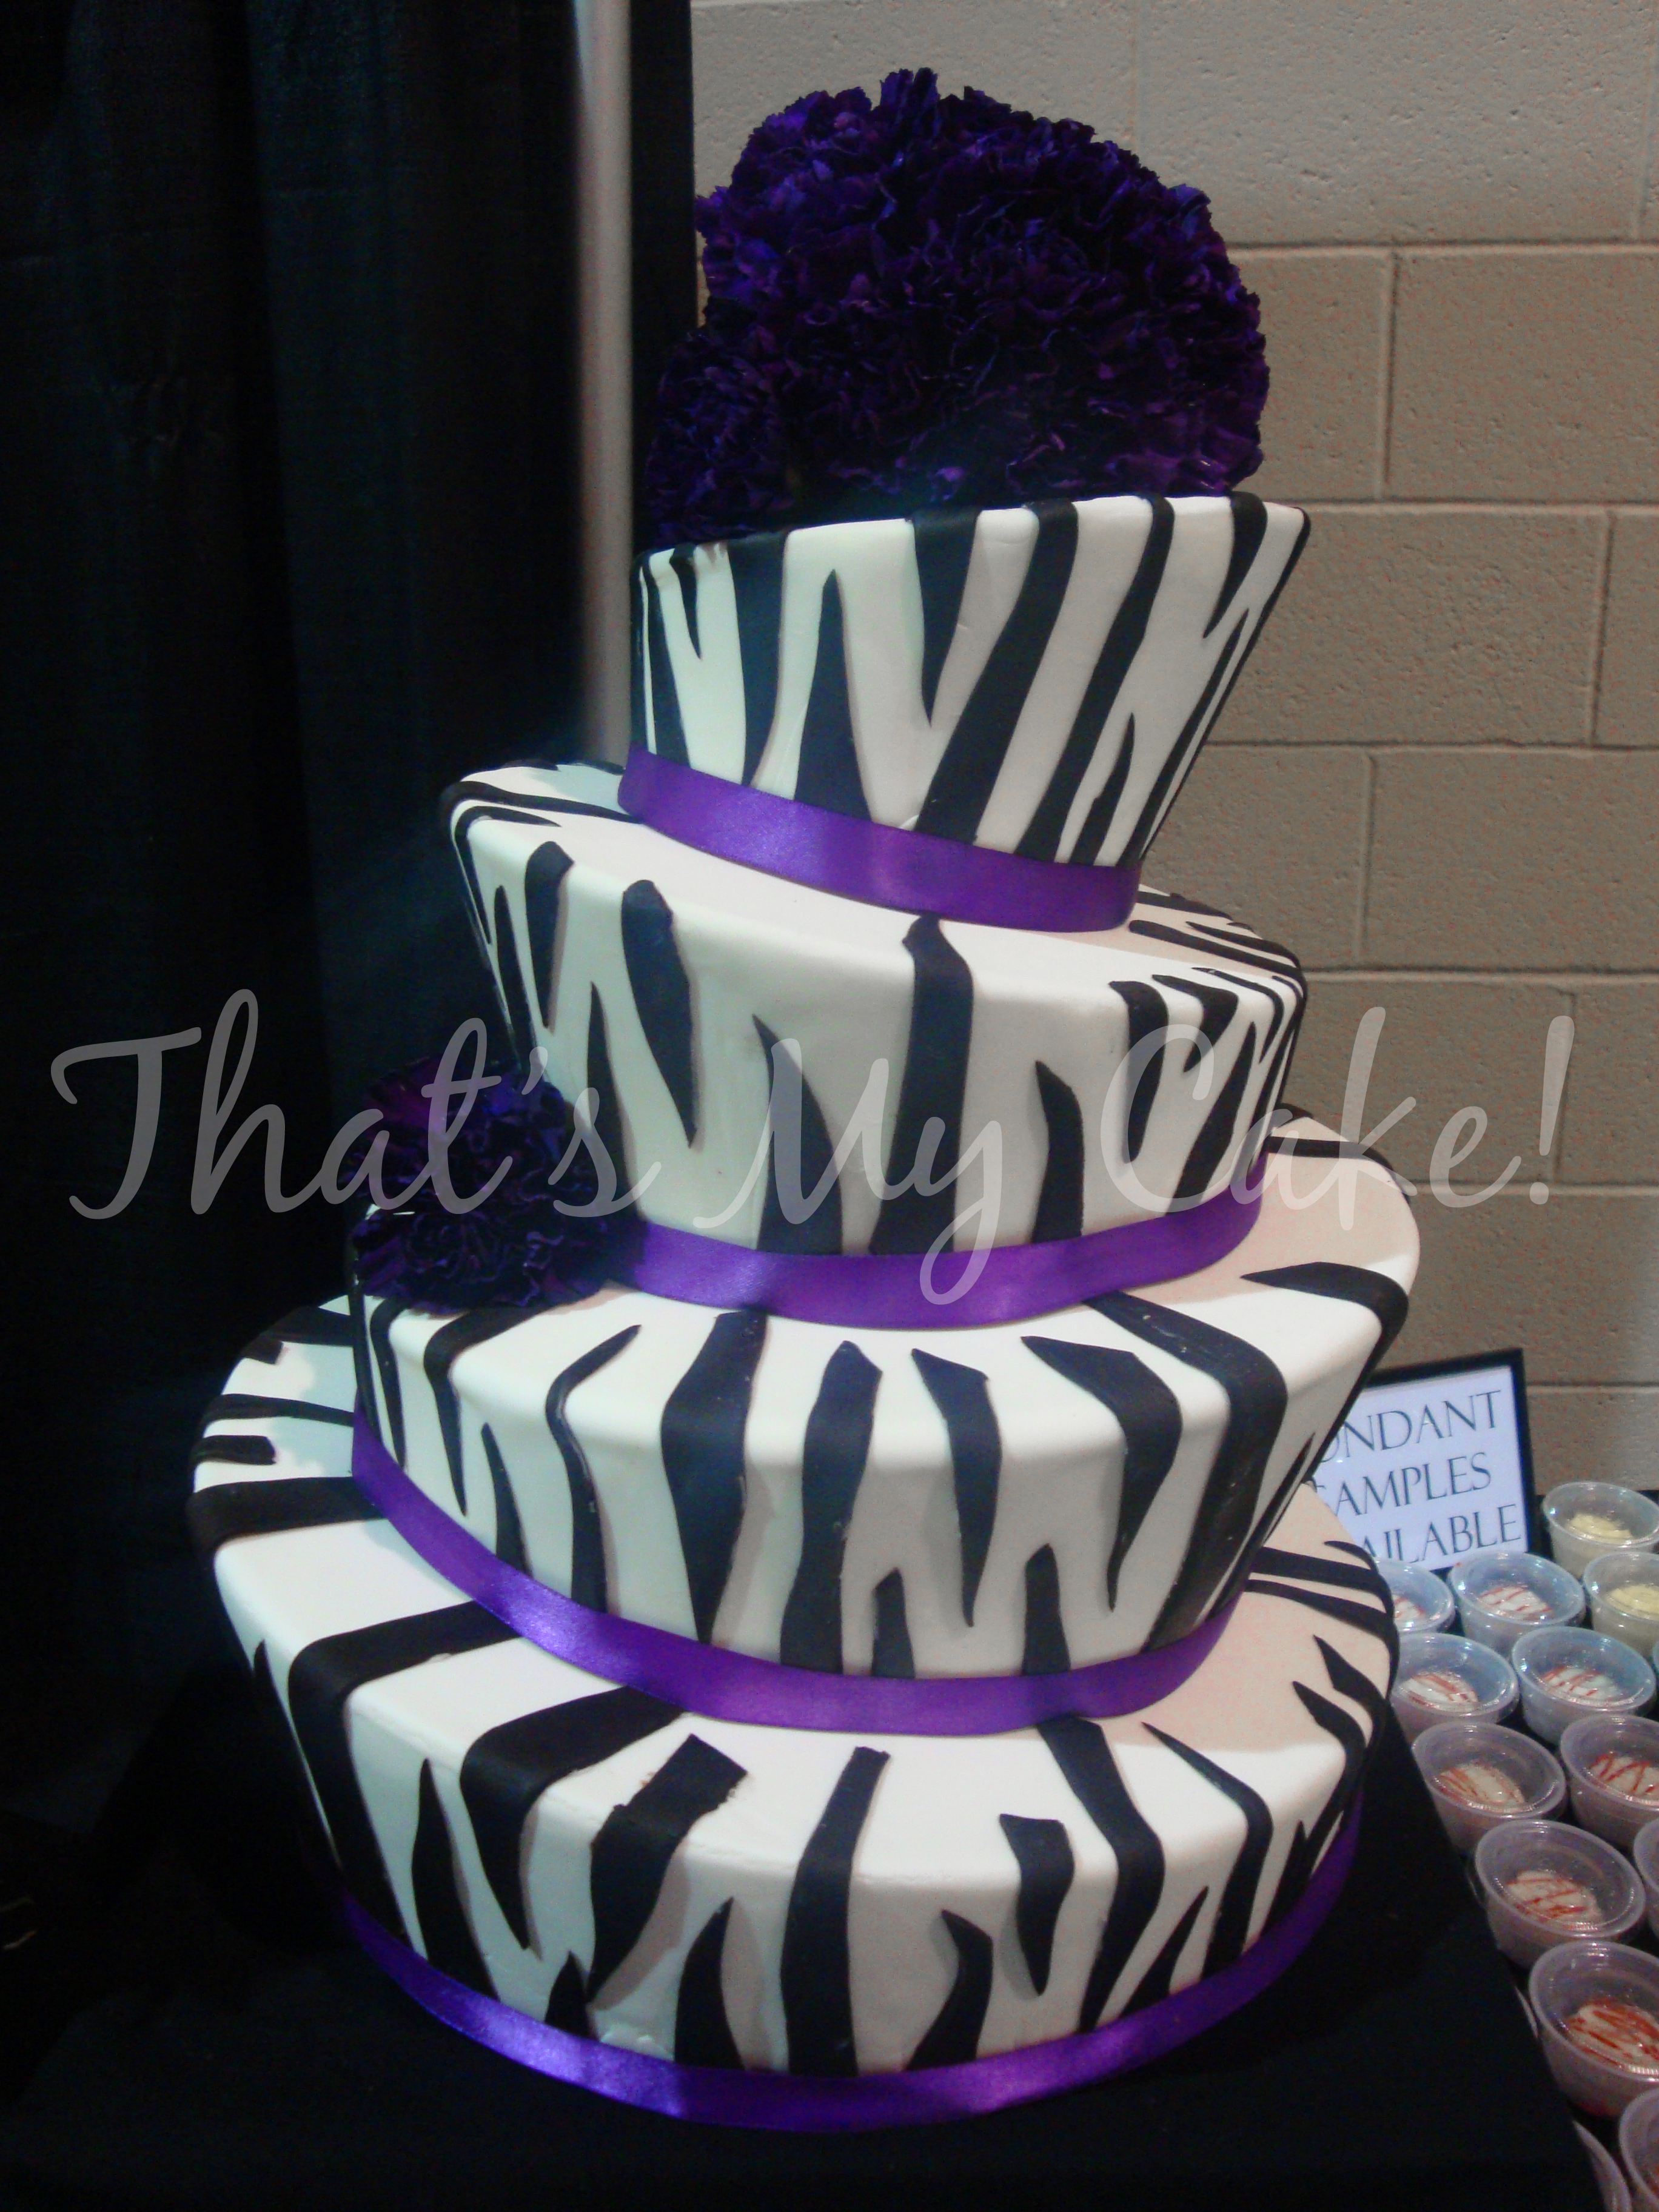 Cake Wedding, Food, Cool Cakes, Cake Ideas, Funky Cake ...